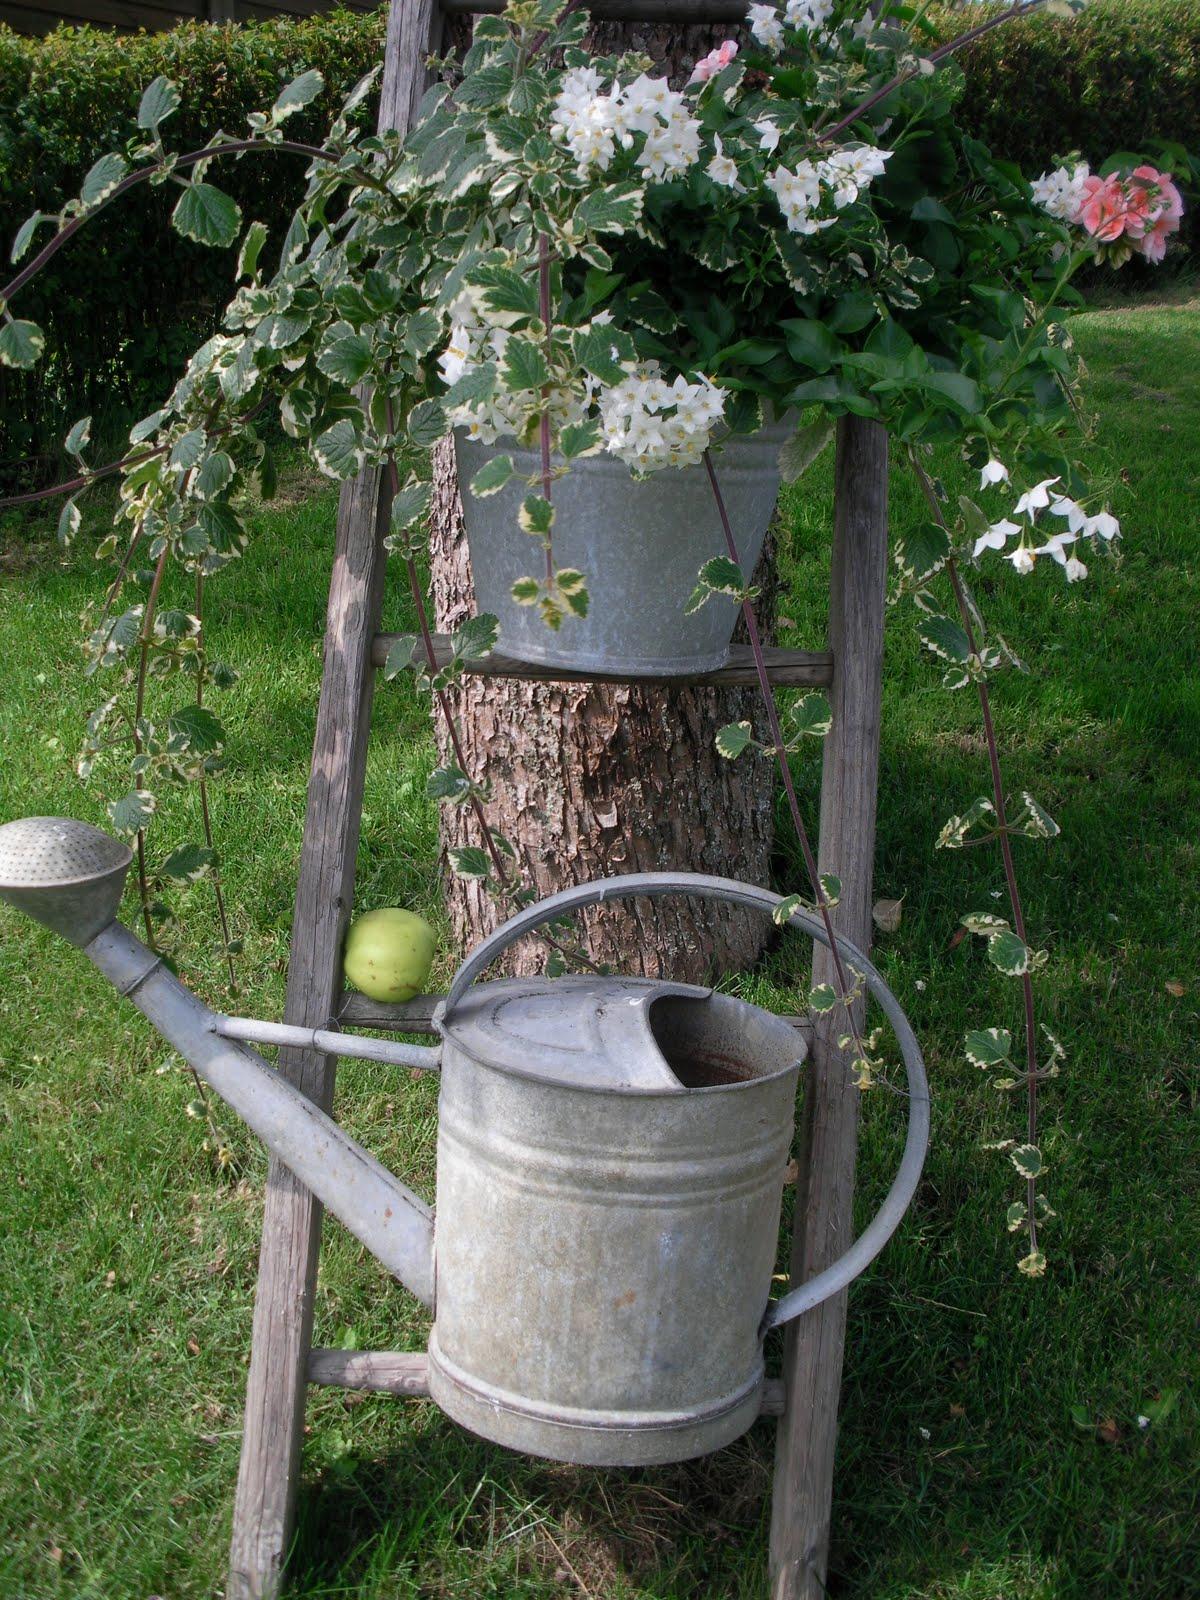 Schön Holzleiter Deko Garten Ideen